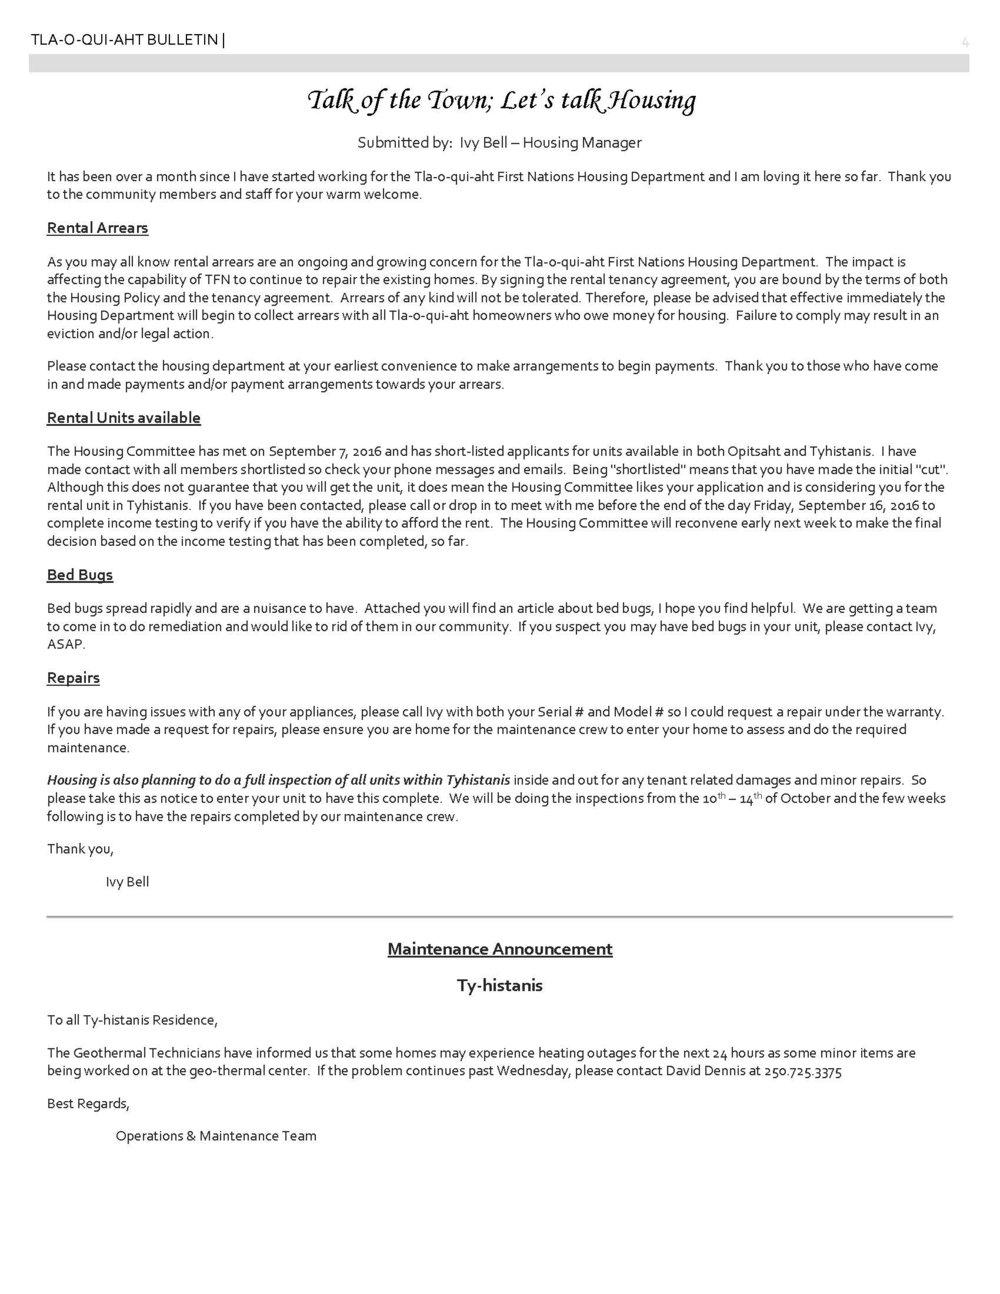 TFN Bulletin Sept 19-2016_Page_04.jpg